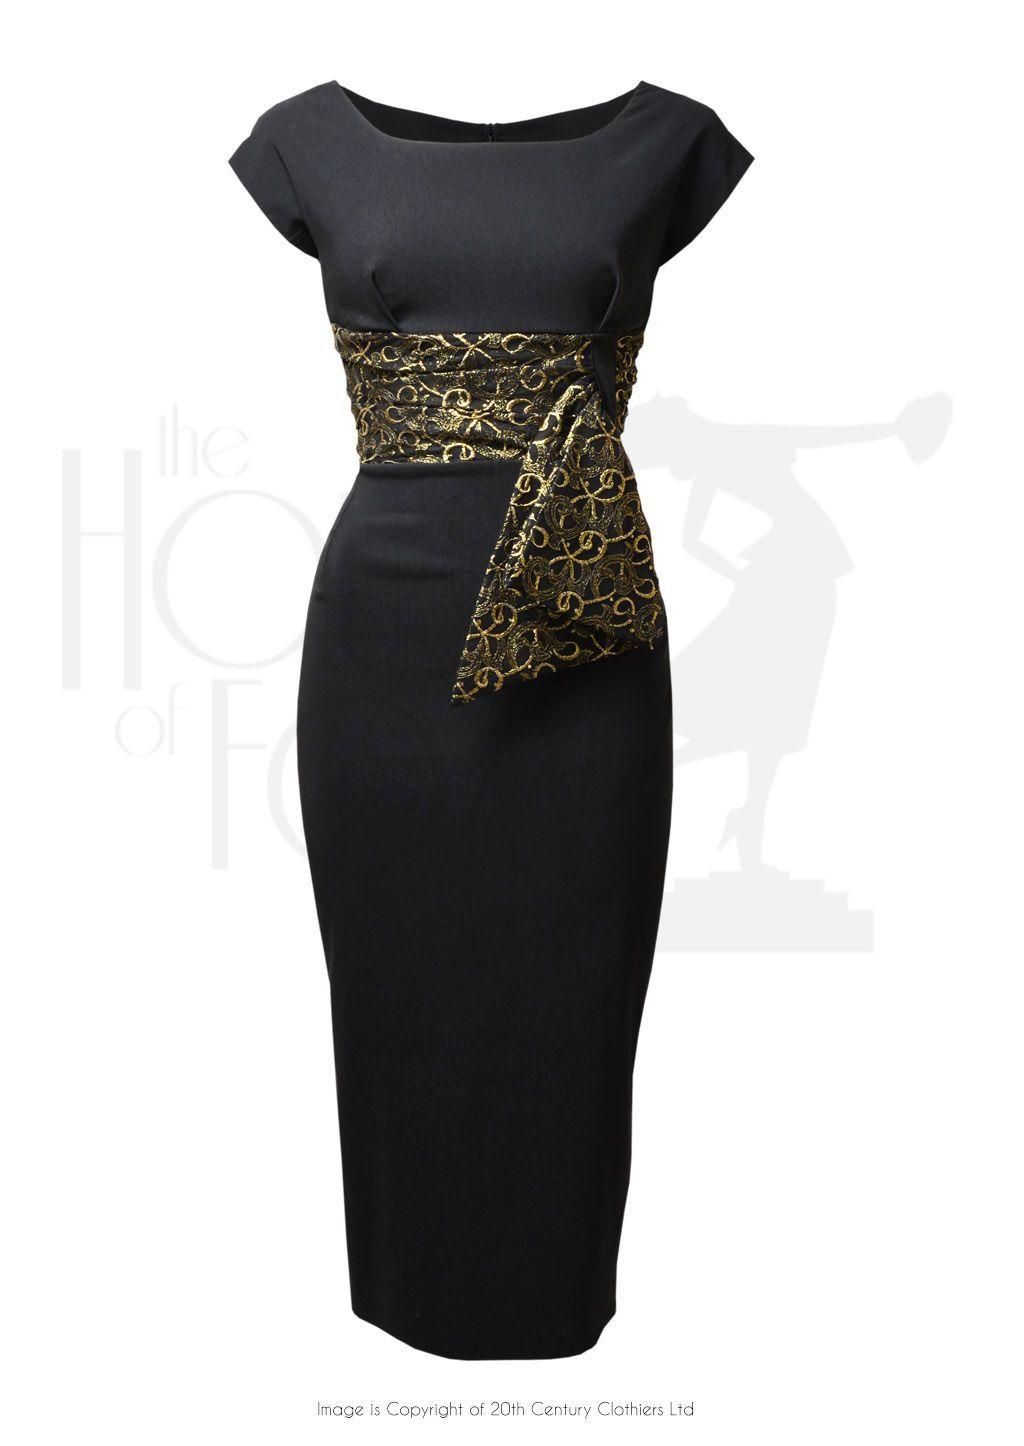 60s Manhattan Cocktail Dress Black Gold Cocktail Dress Maternity Black Cocktail Dress 60s Cocktail Dress [ 1446 x 1024 Pixel ]